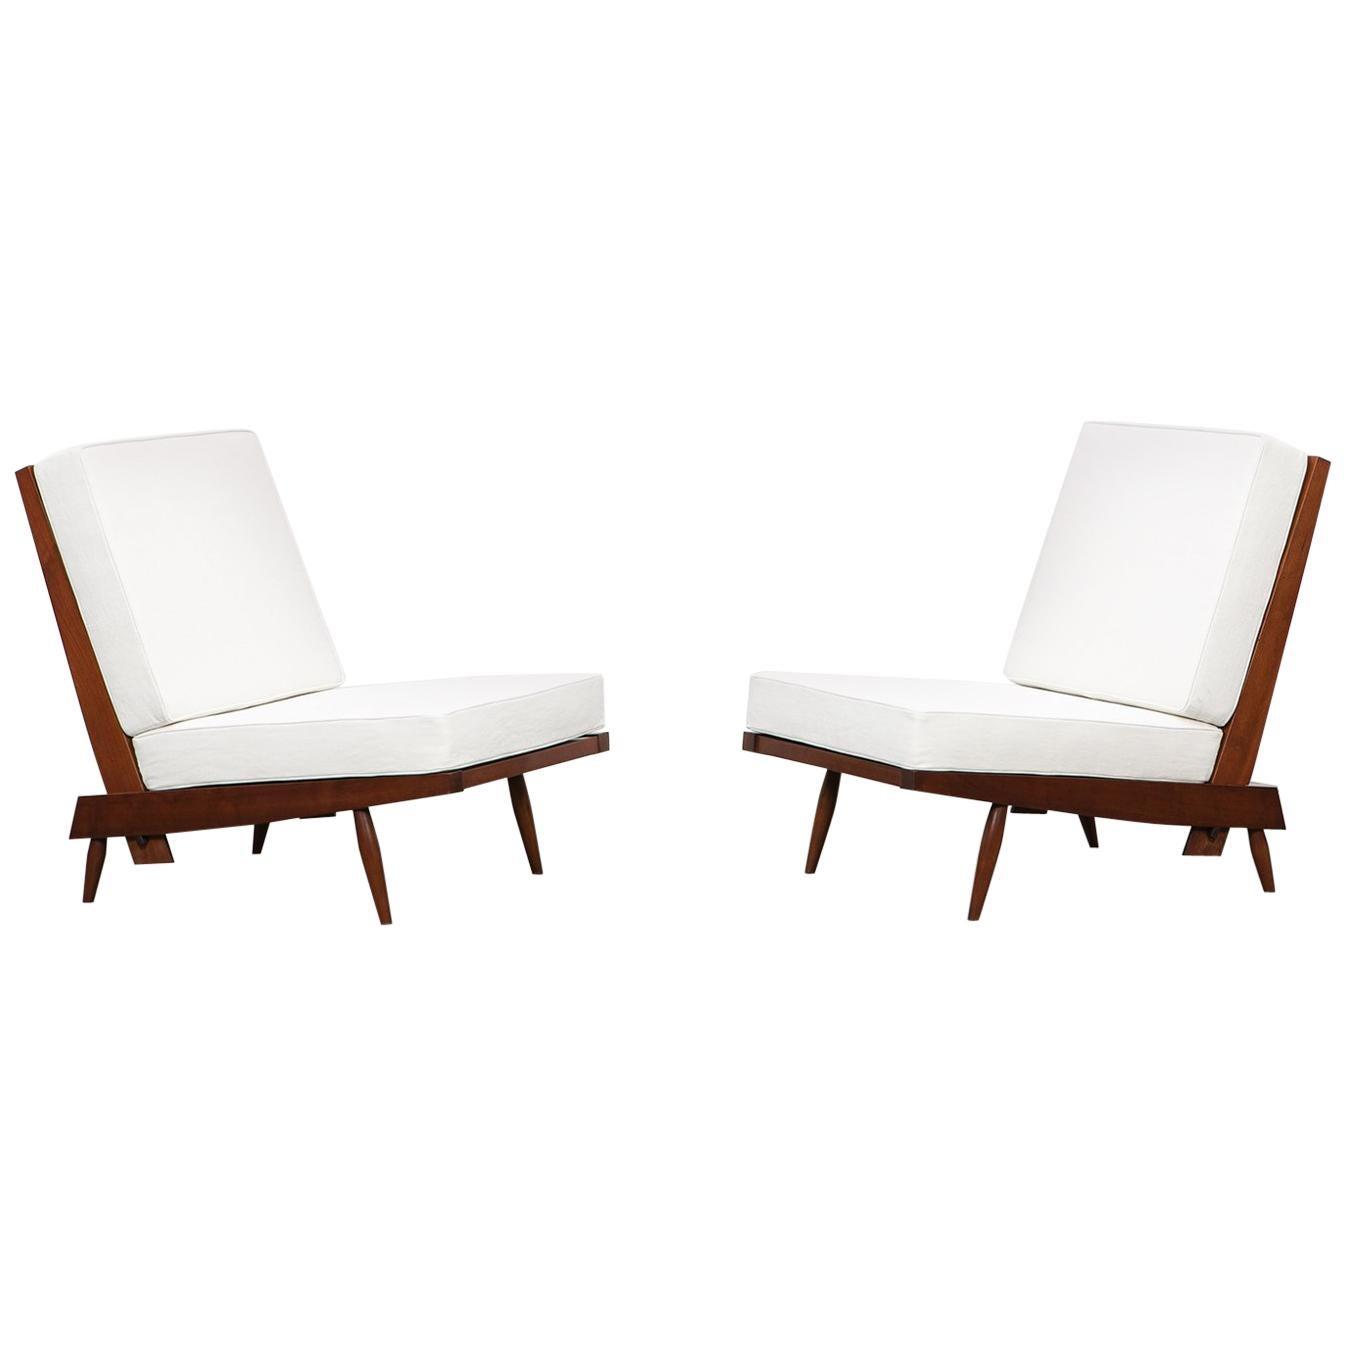 1960s Walnut Lounge Chairs by George Nakashima